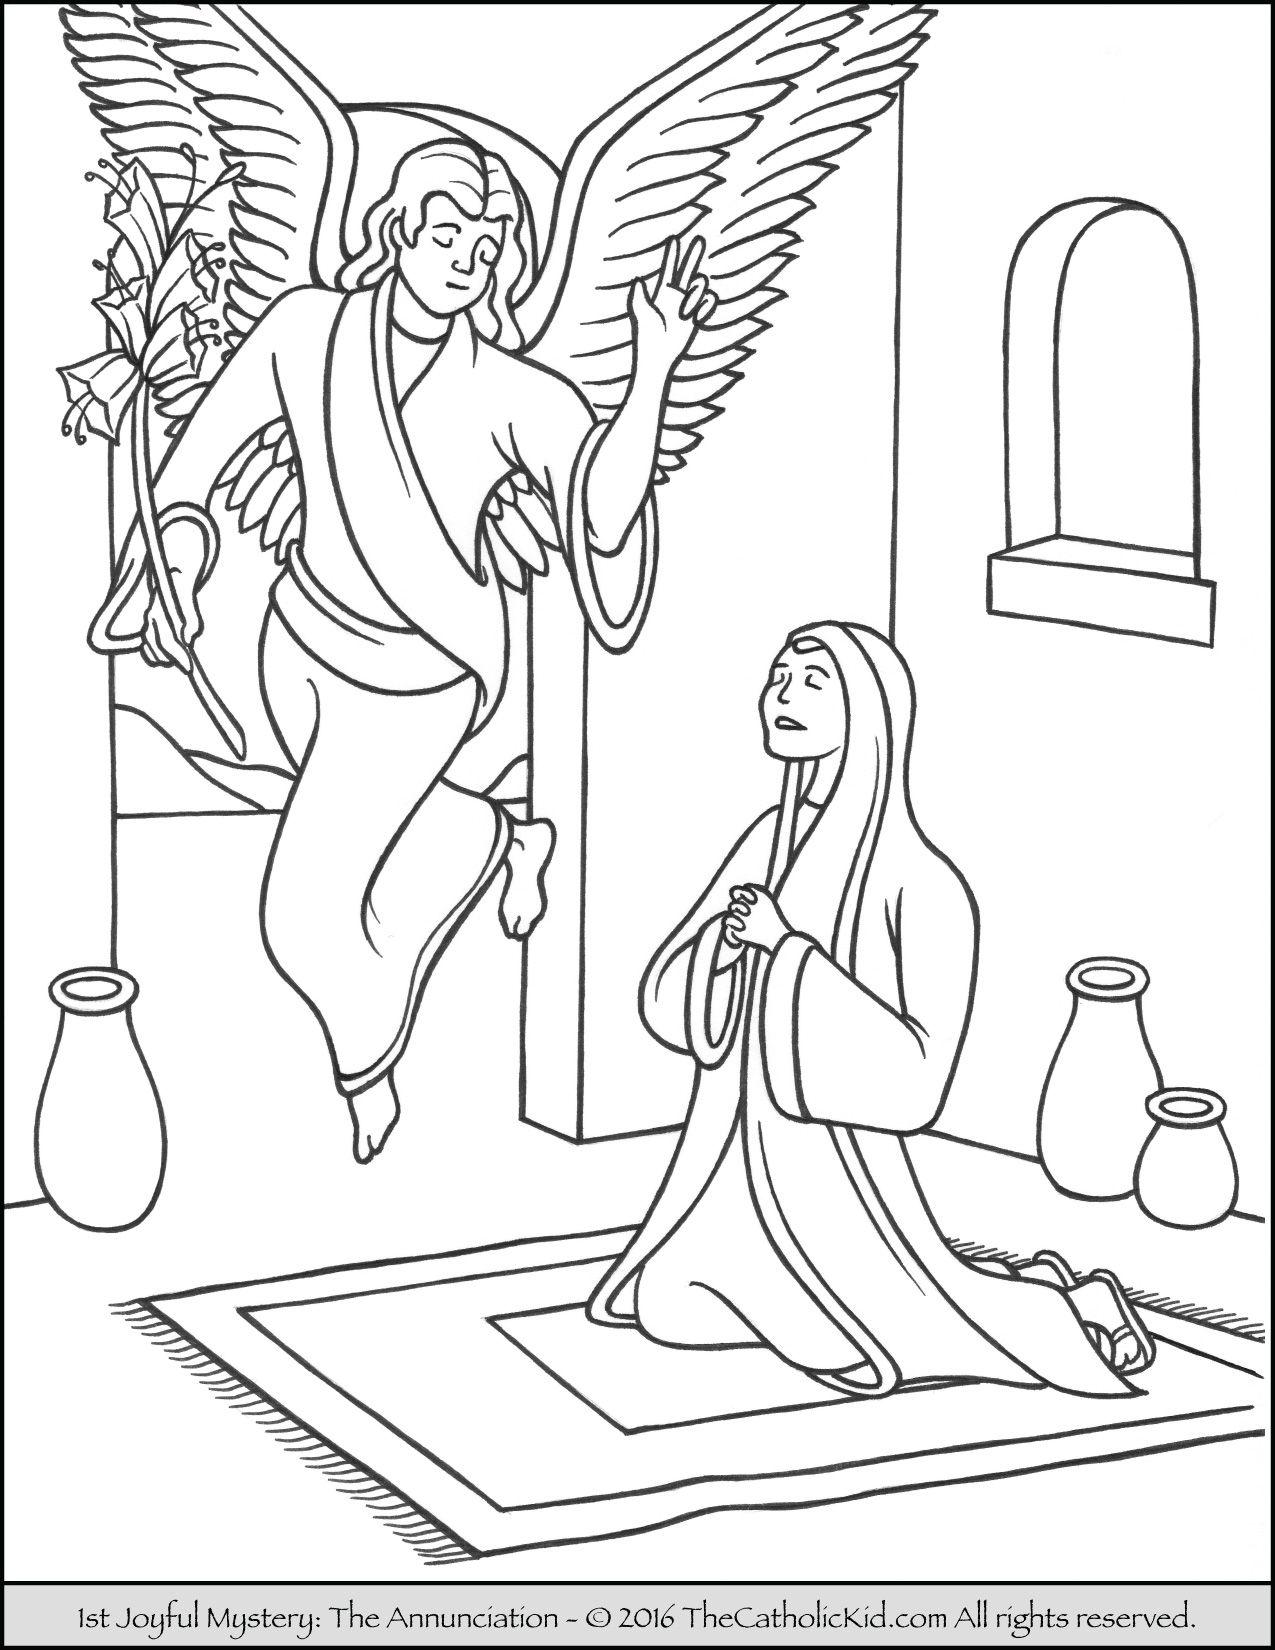 The 1st Joyful Mystery Coloring Page - Annunciation | Joyful